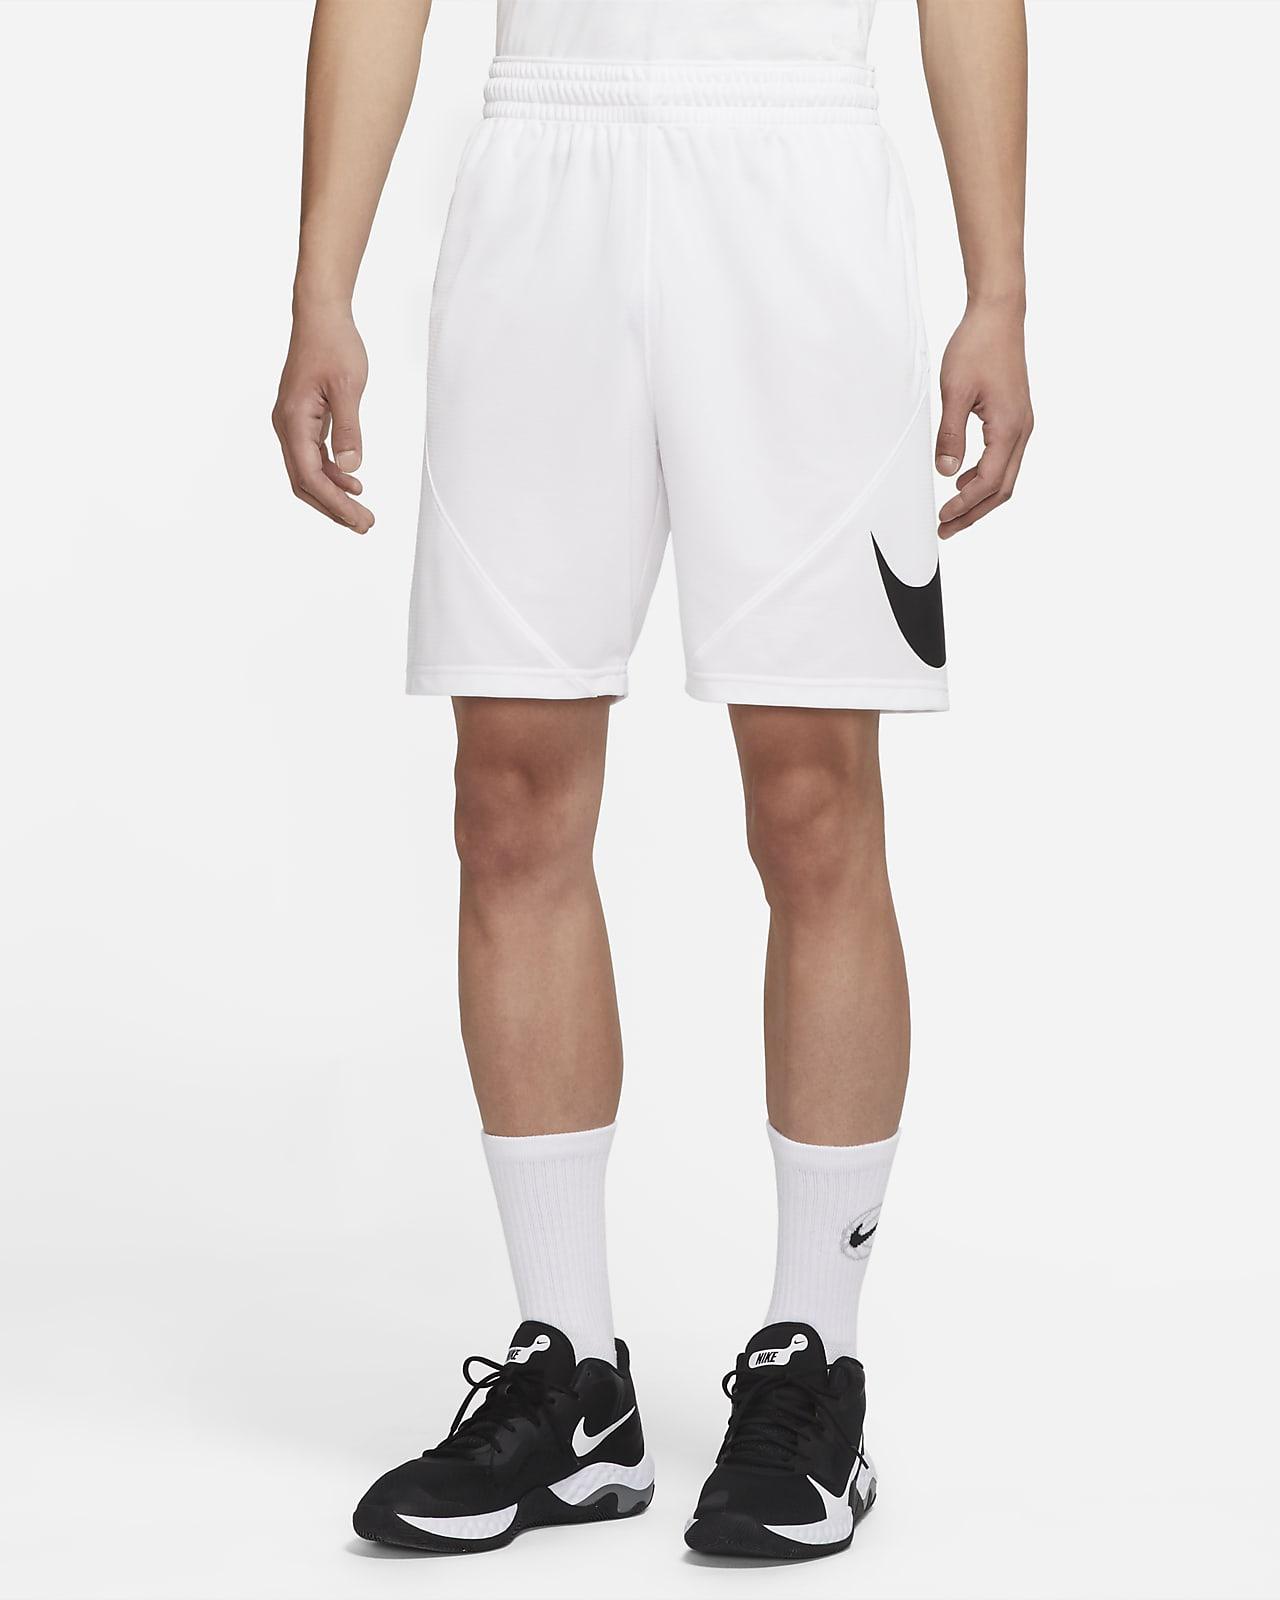 Nike HBR 男子篮球短裤